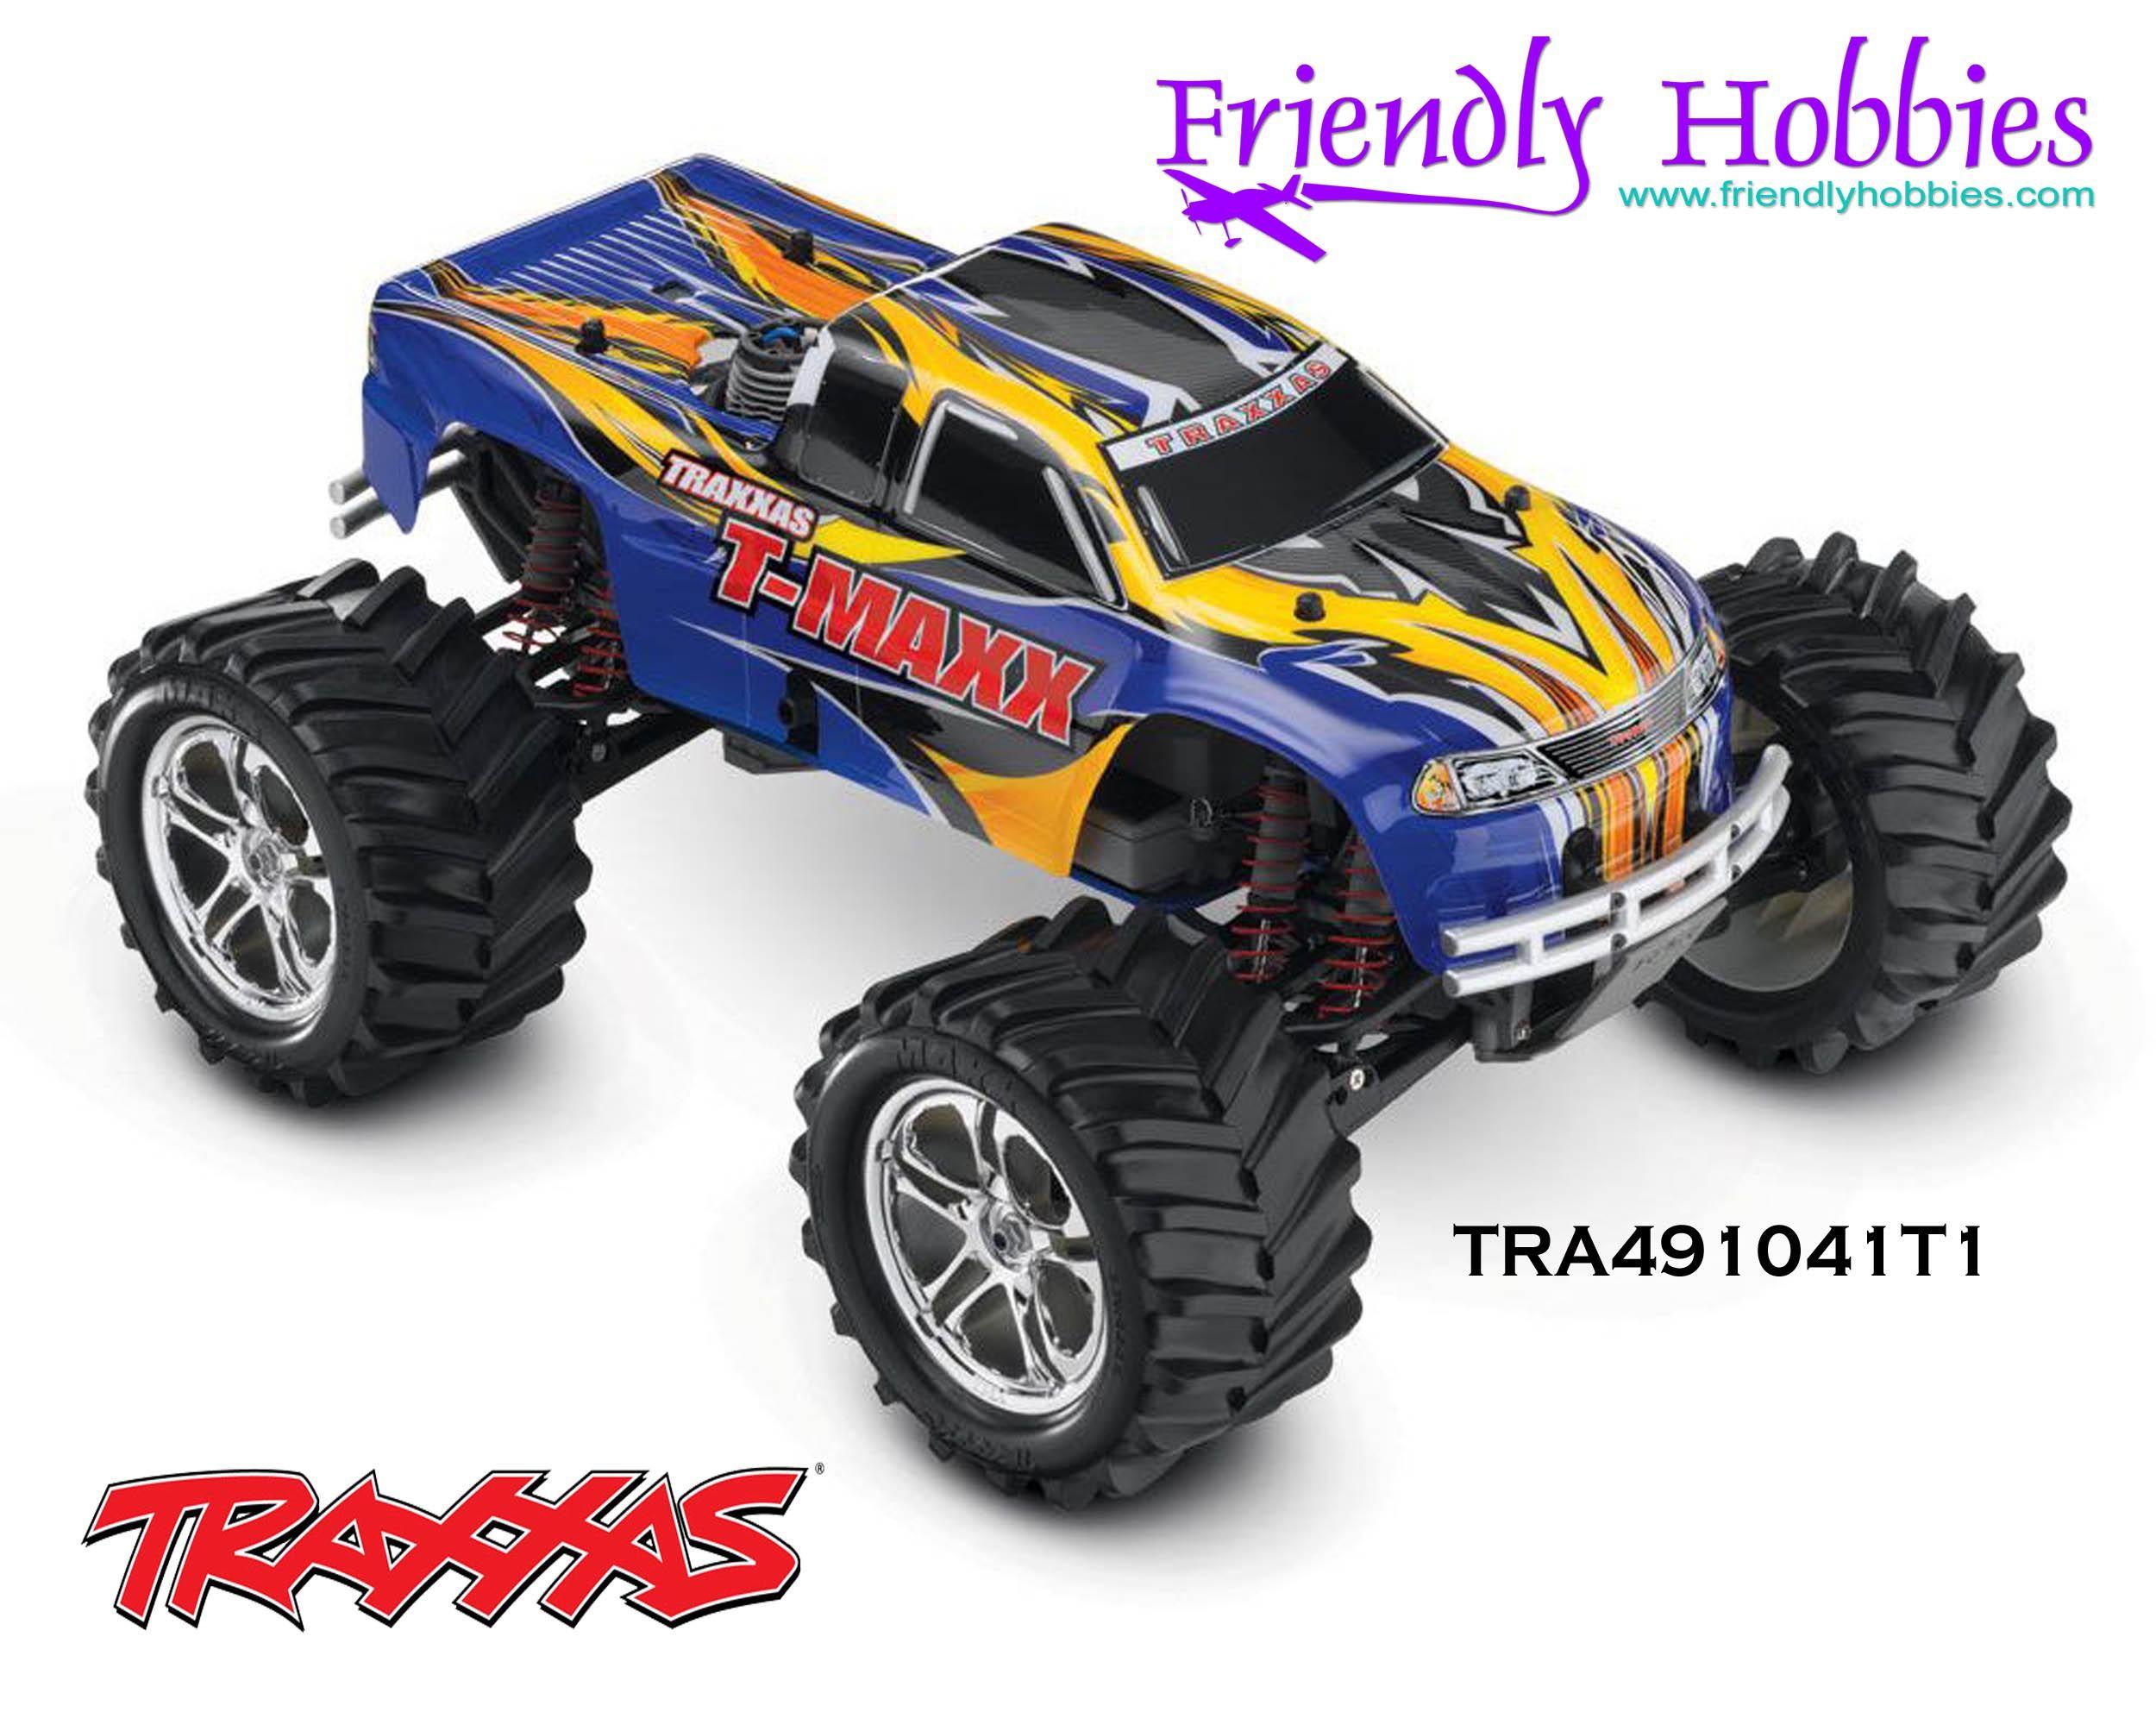 Traxxas 1/10 TMaxx 4WD Nitro Monster Truck Blue, Black